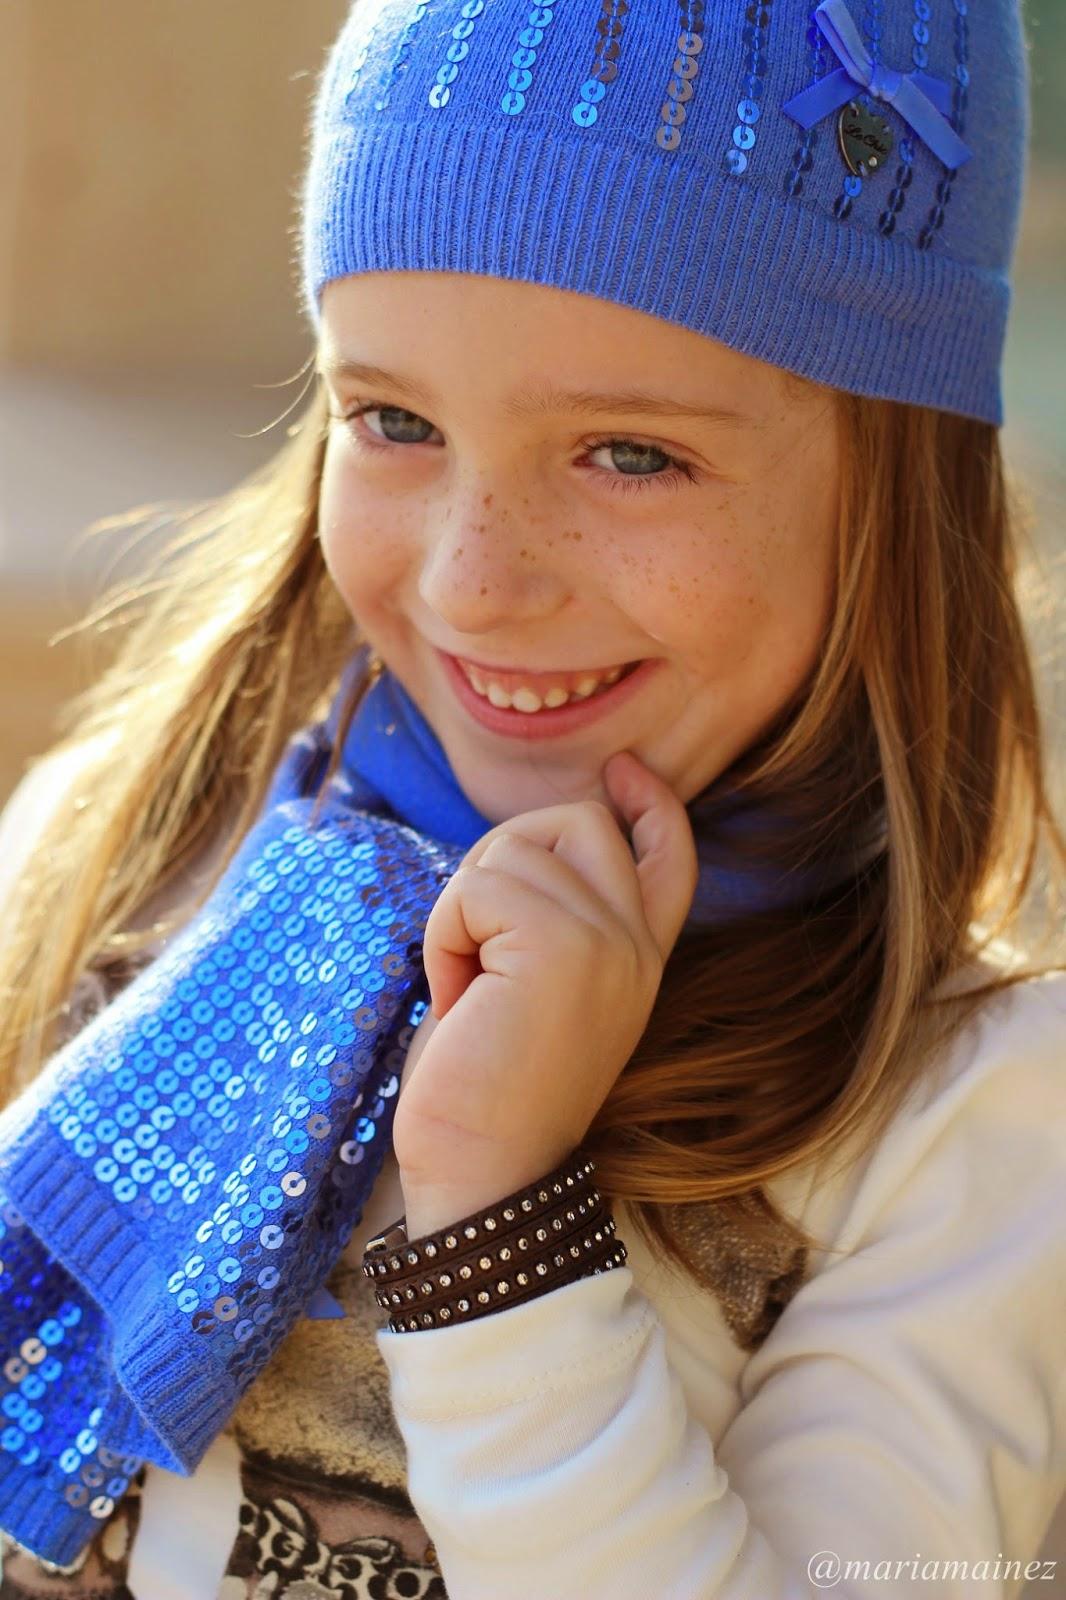 Little blogger - streetstyle kids - fashion kids - niña blogger